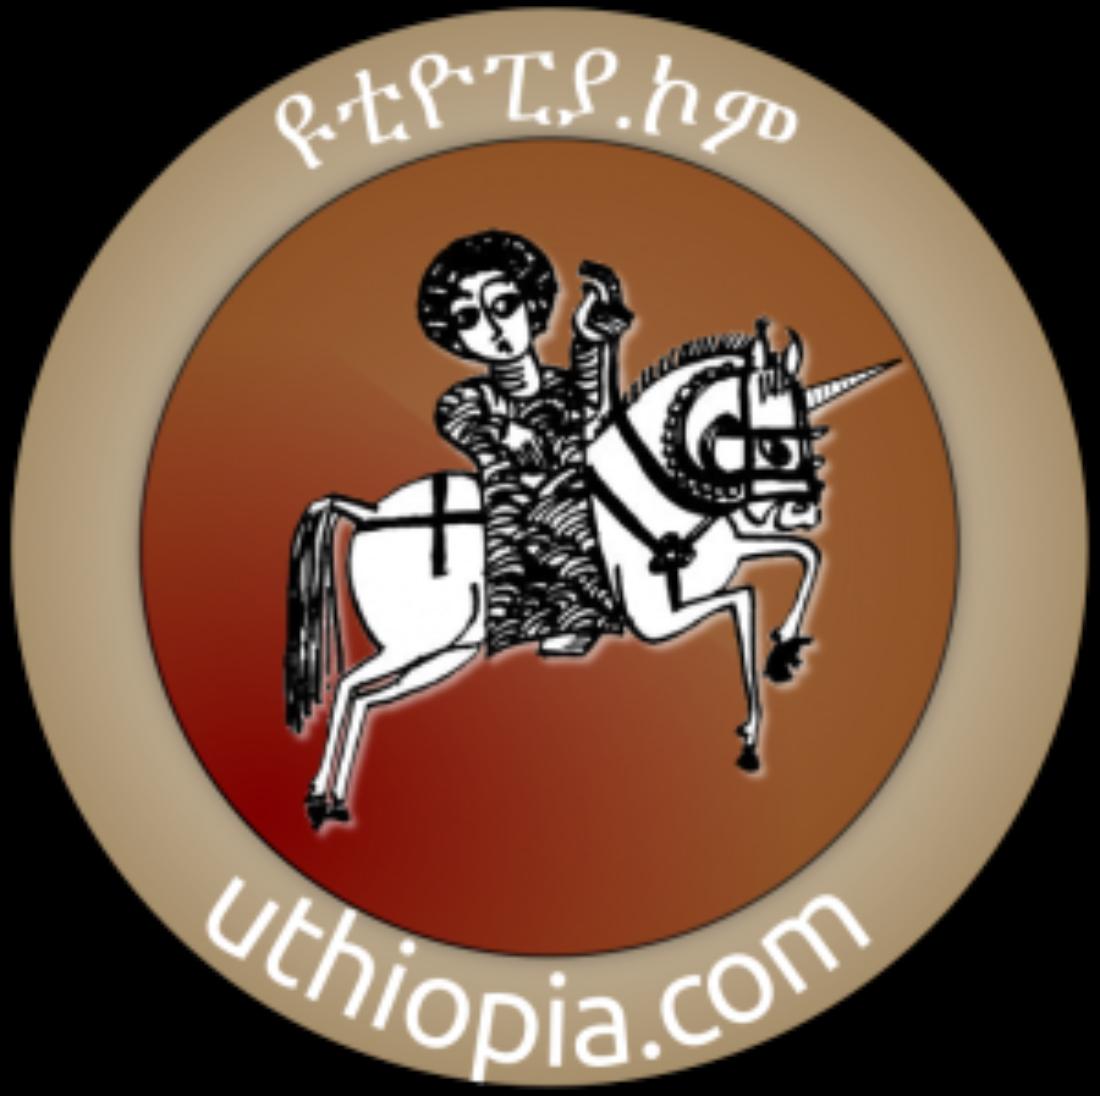 |ዩ| Utopia in Ethiopia